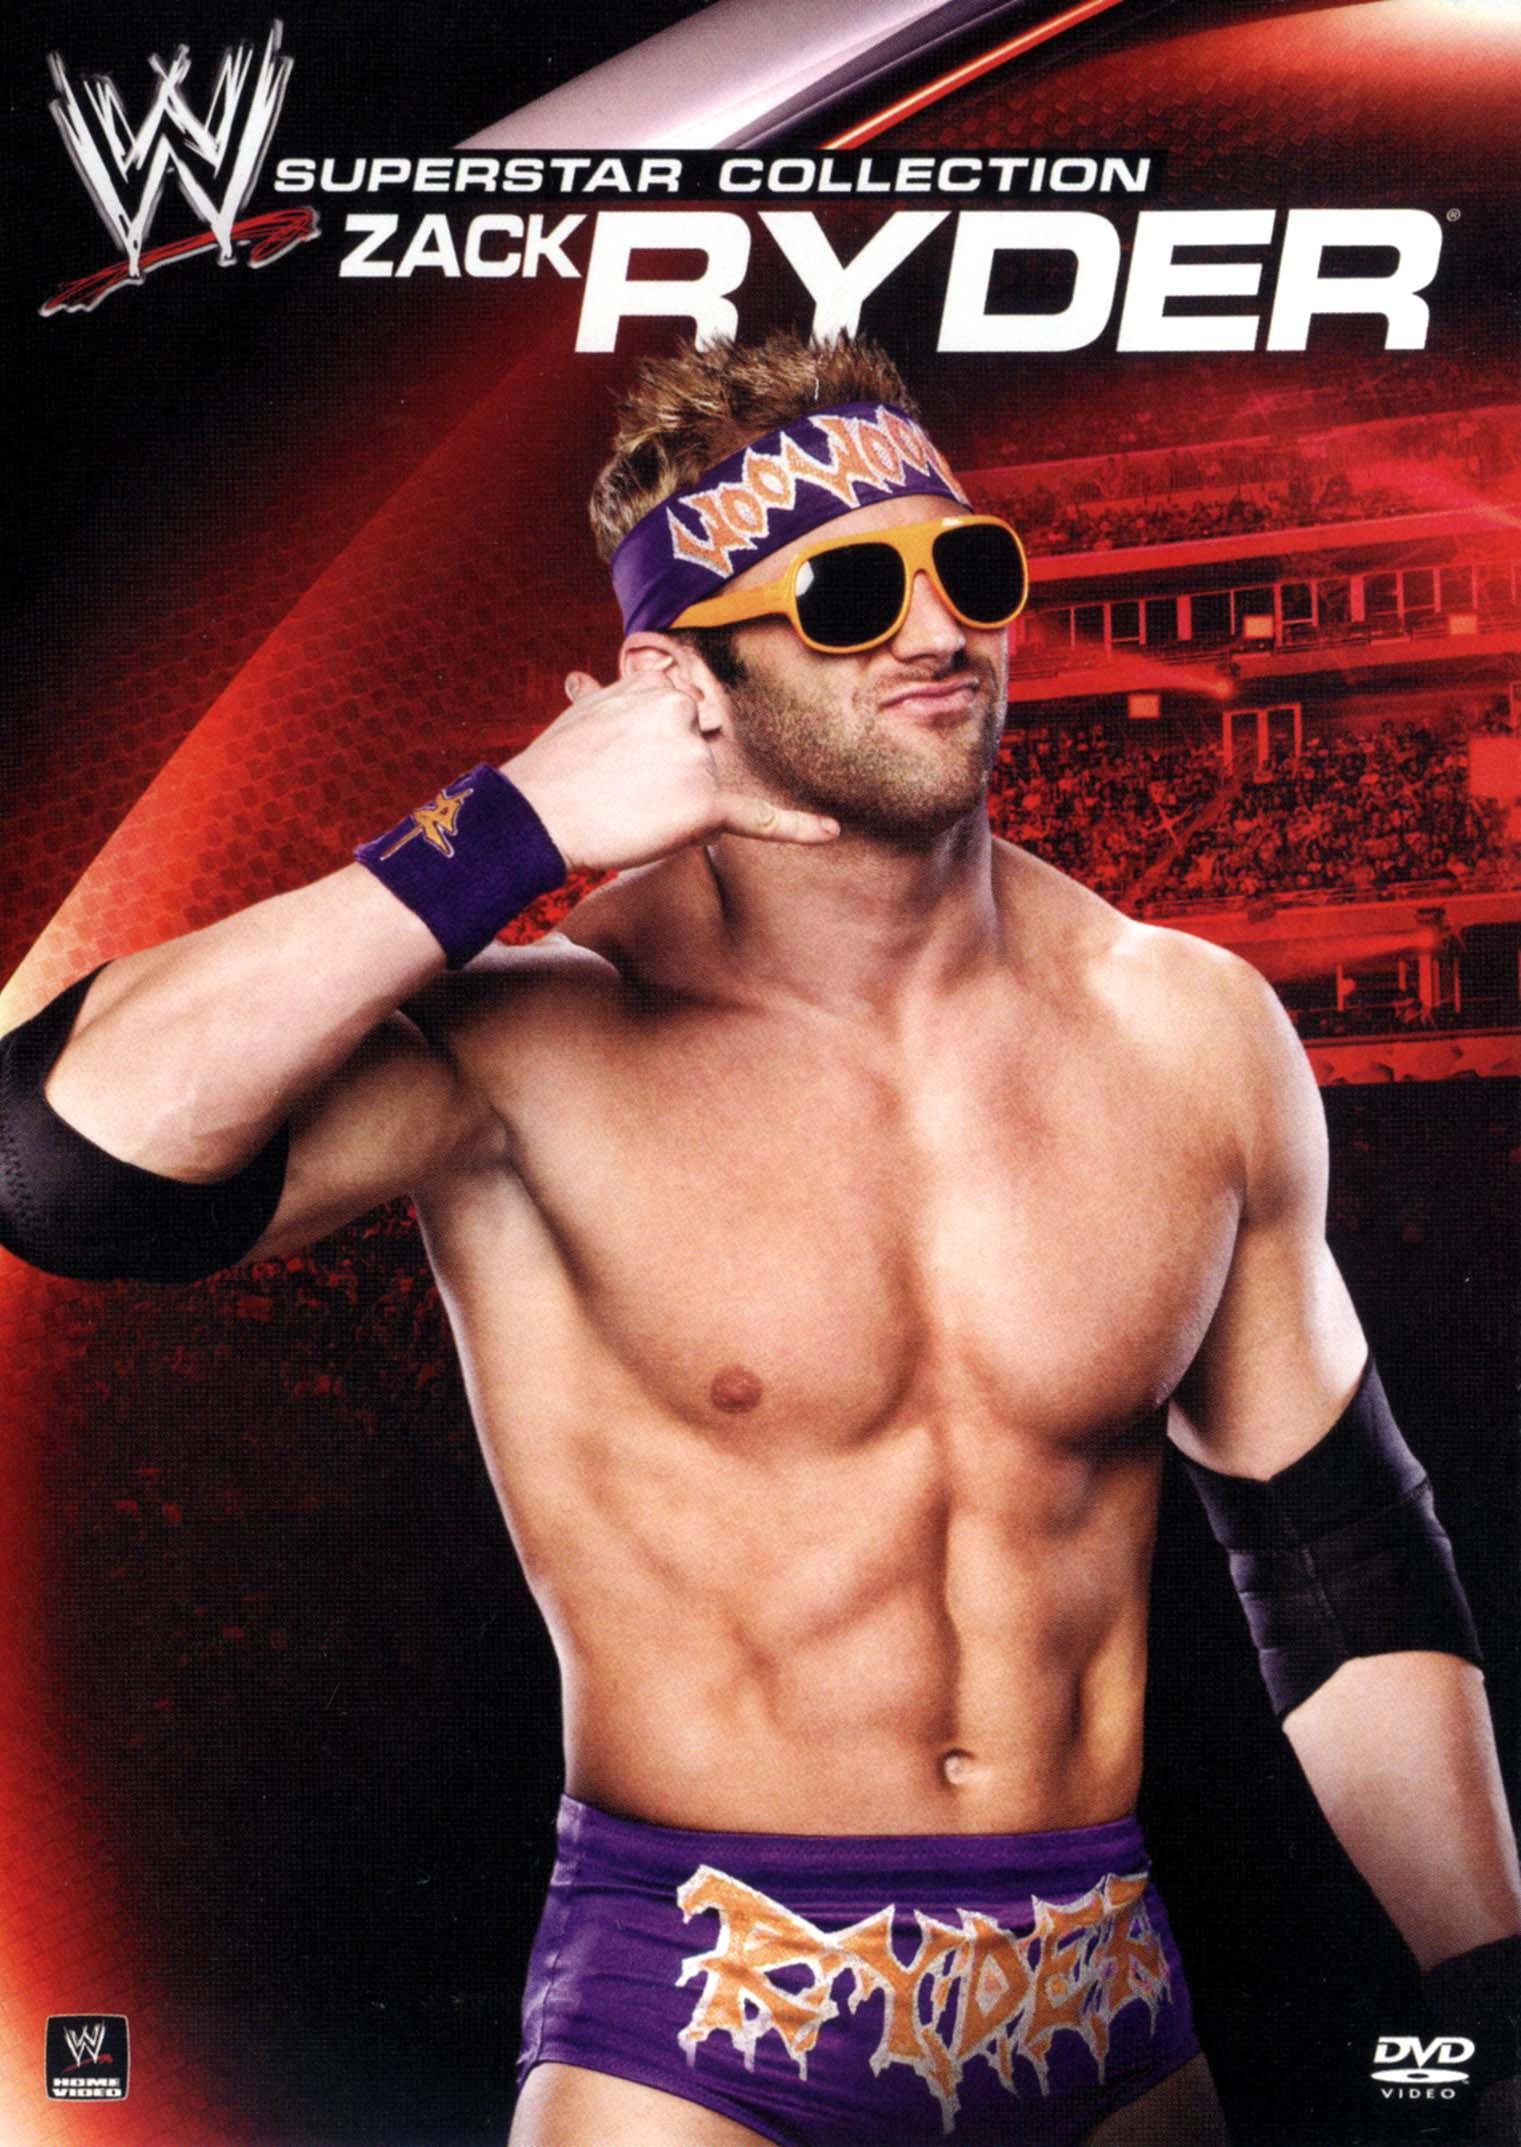 WWE: Superstar Collection - Zack Ryder